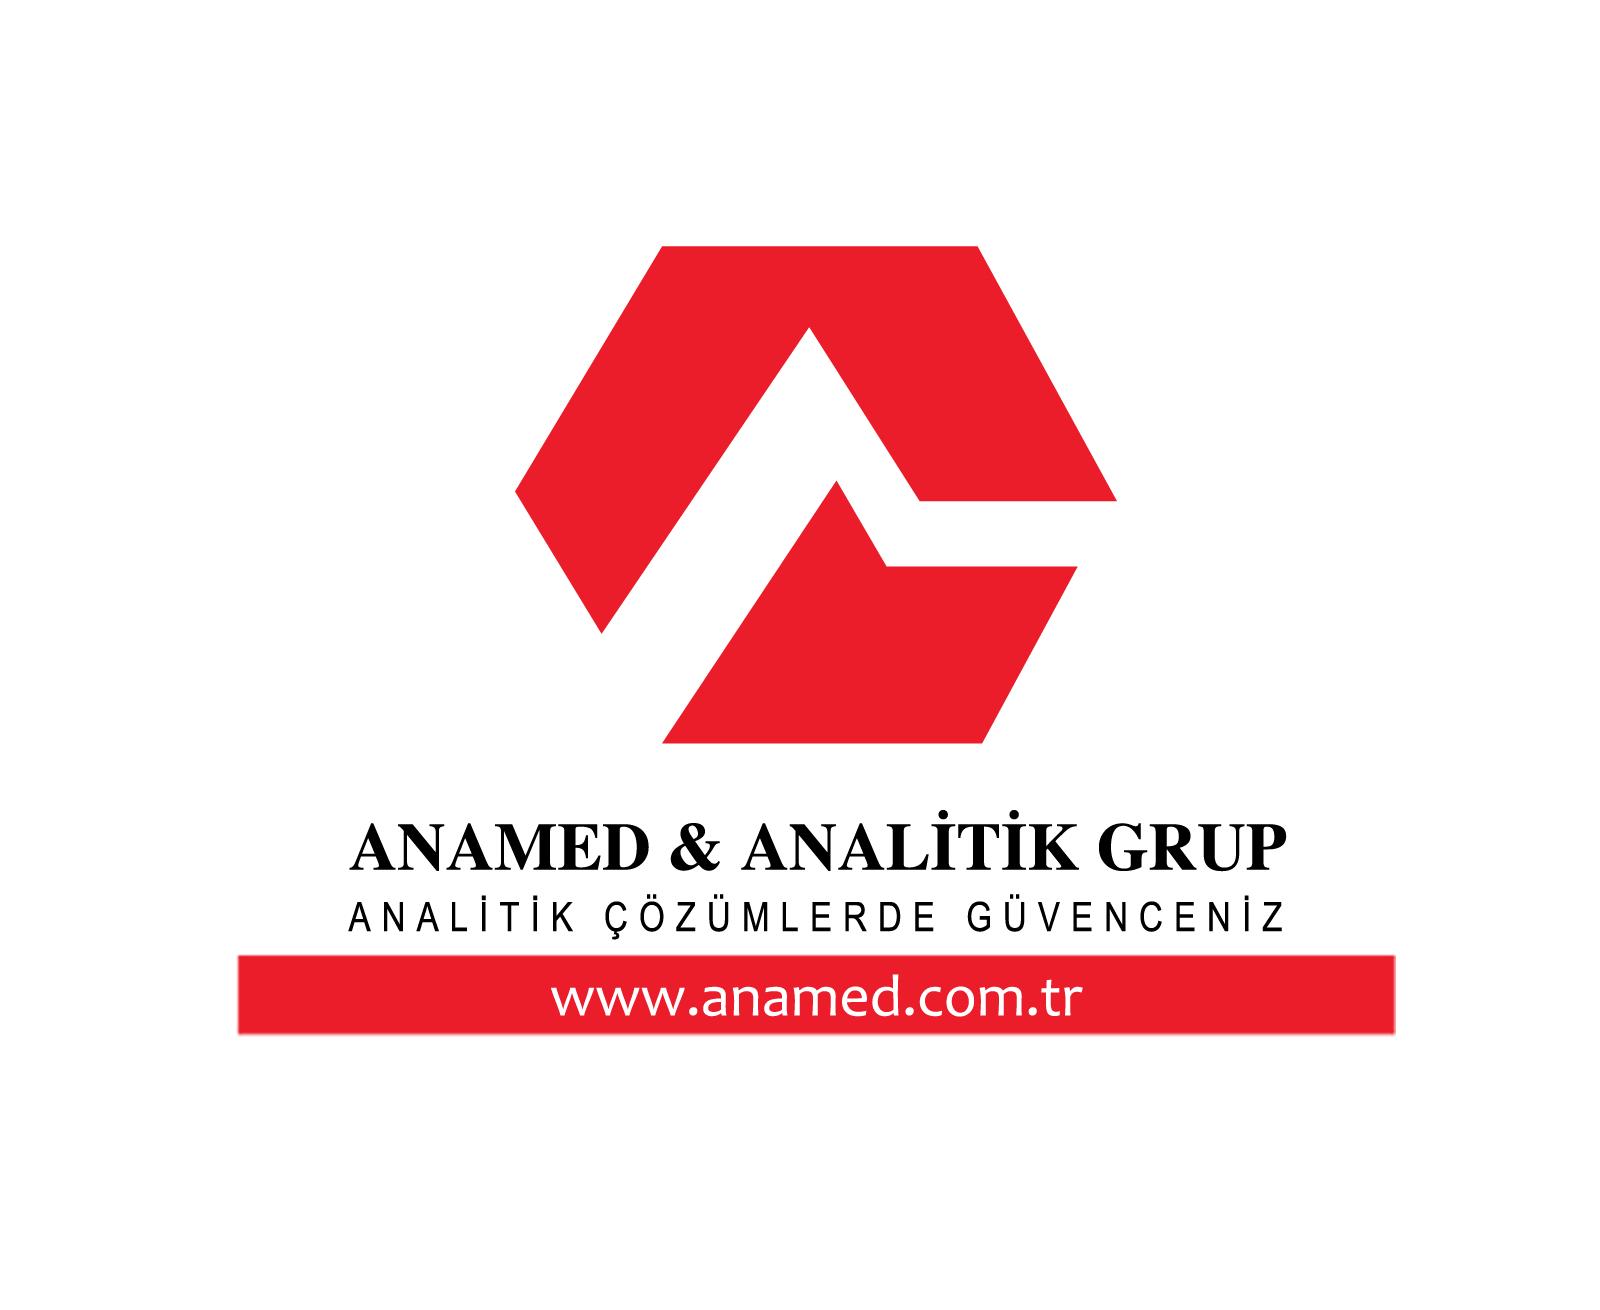 ANAMED & ANALİTİK GRUP